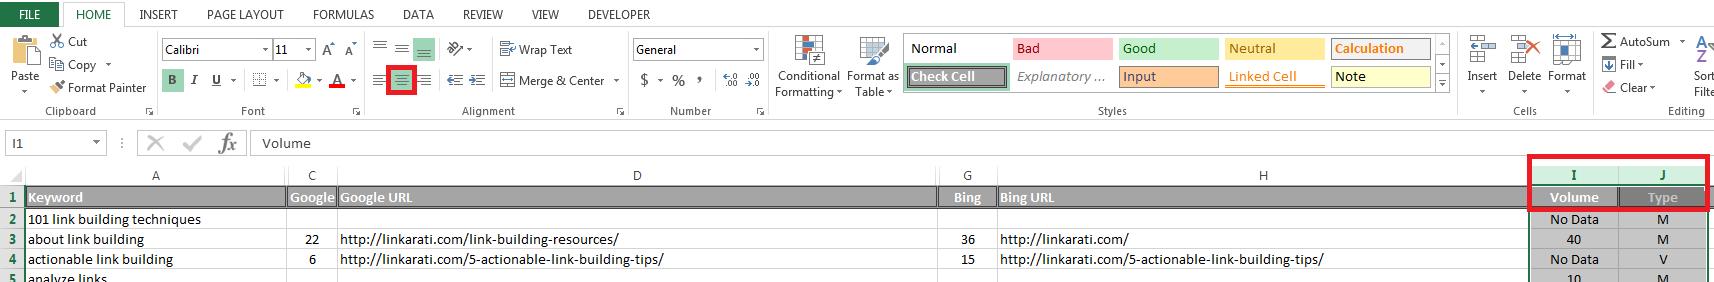 NSC ALA data points centered